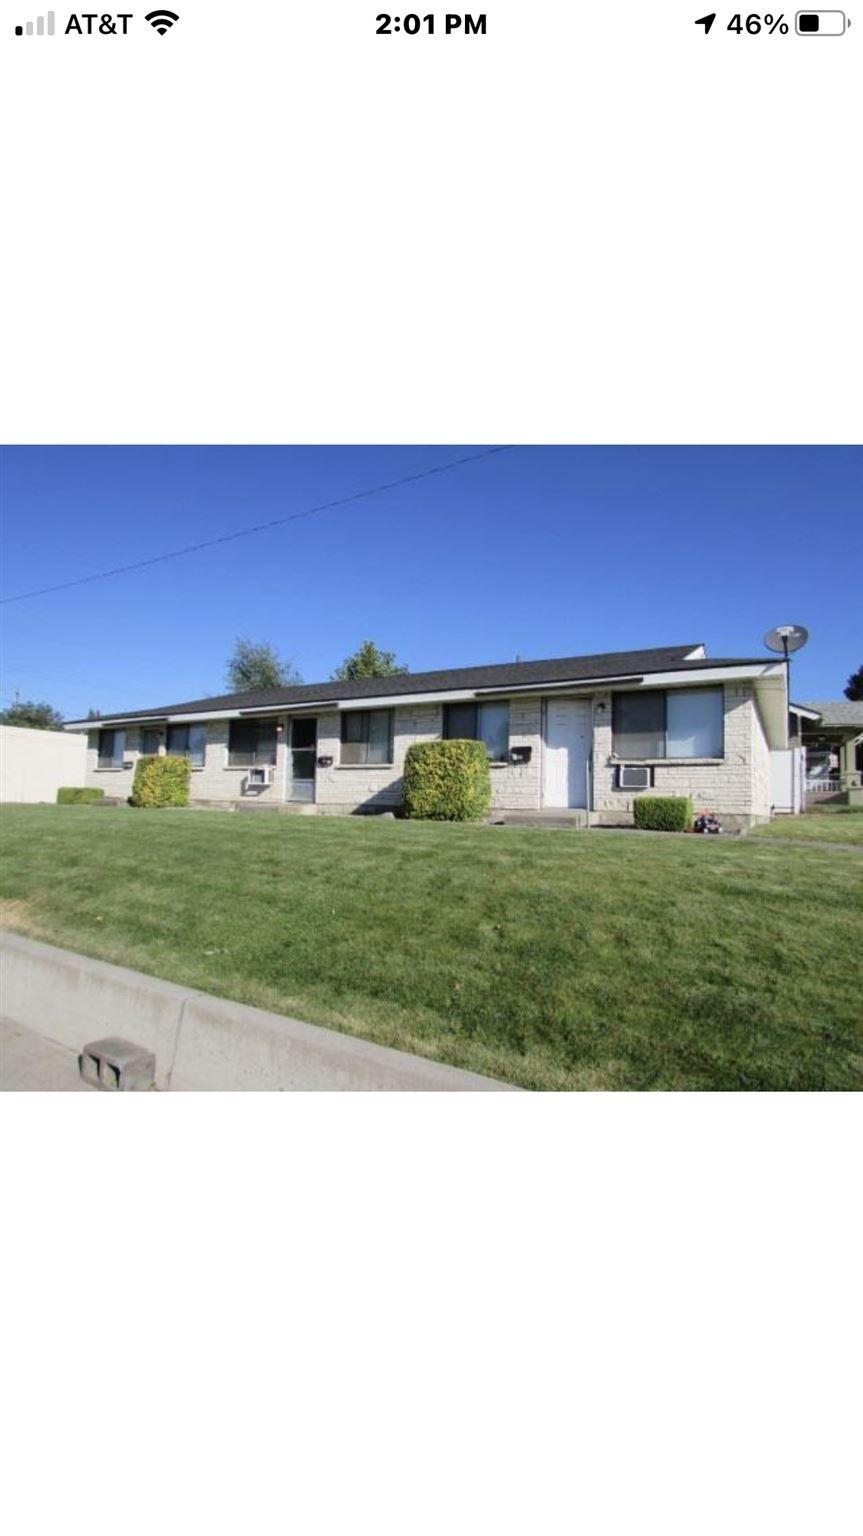 819 E Cleveland Ave, Spokane, WA 99207-2710 - #: 202110727